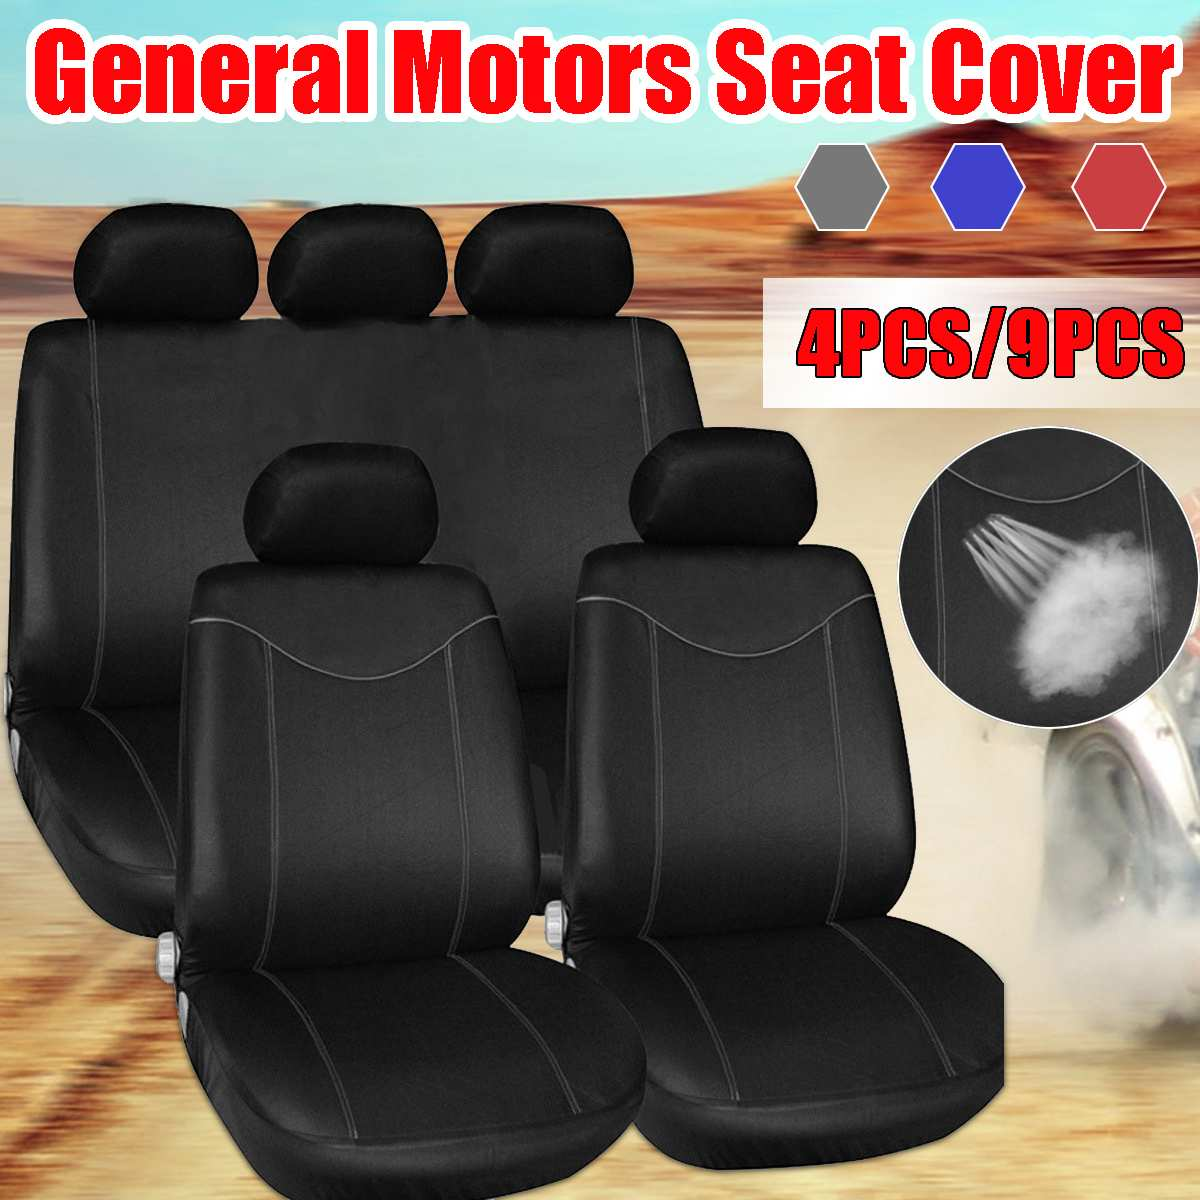 4/9pcs רכב מושב מכסה מלא סט אוניברסלי אוטומטי מושב מגן כרית קדמי אחורי כיסוי פנים אביזרי רכב רכב סטיילינג